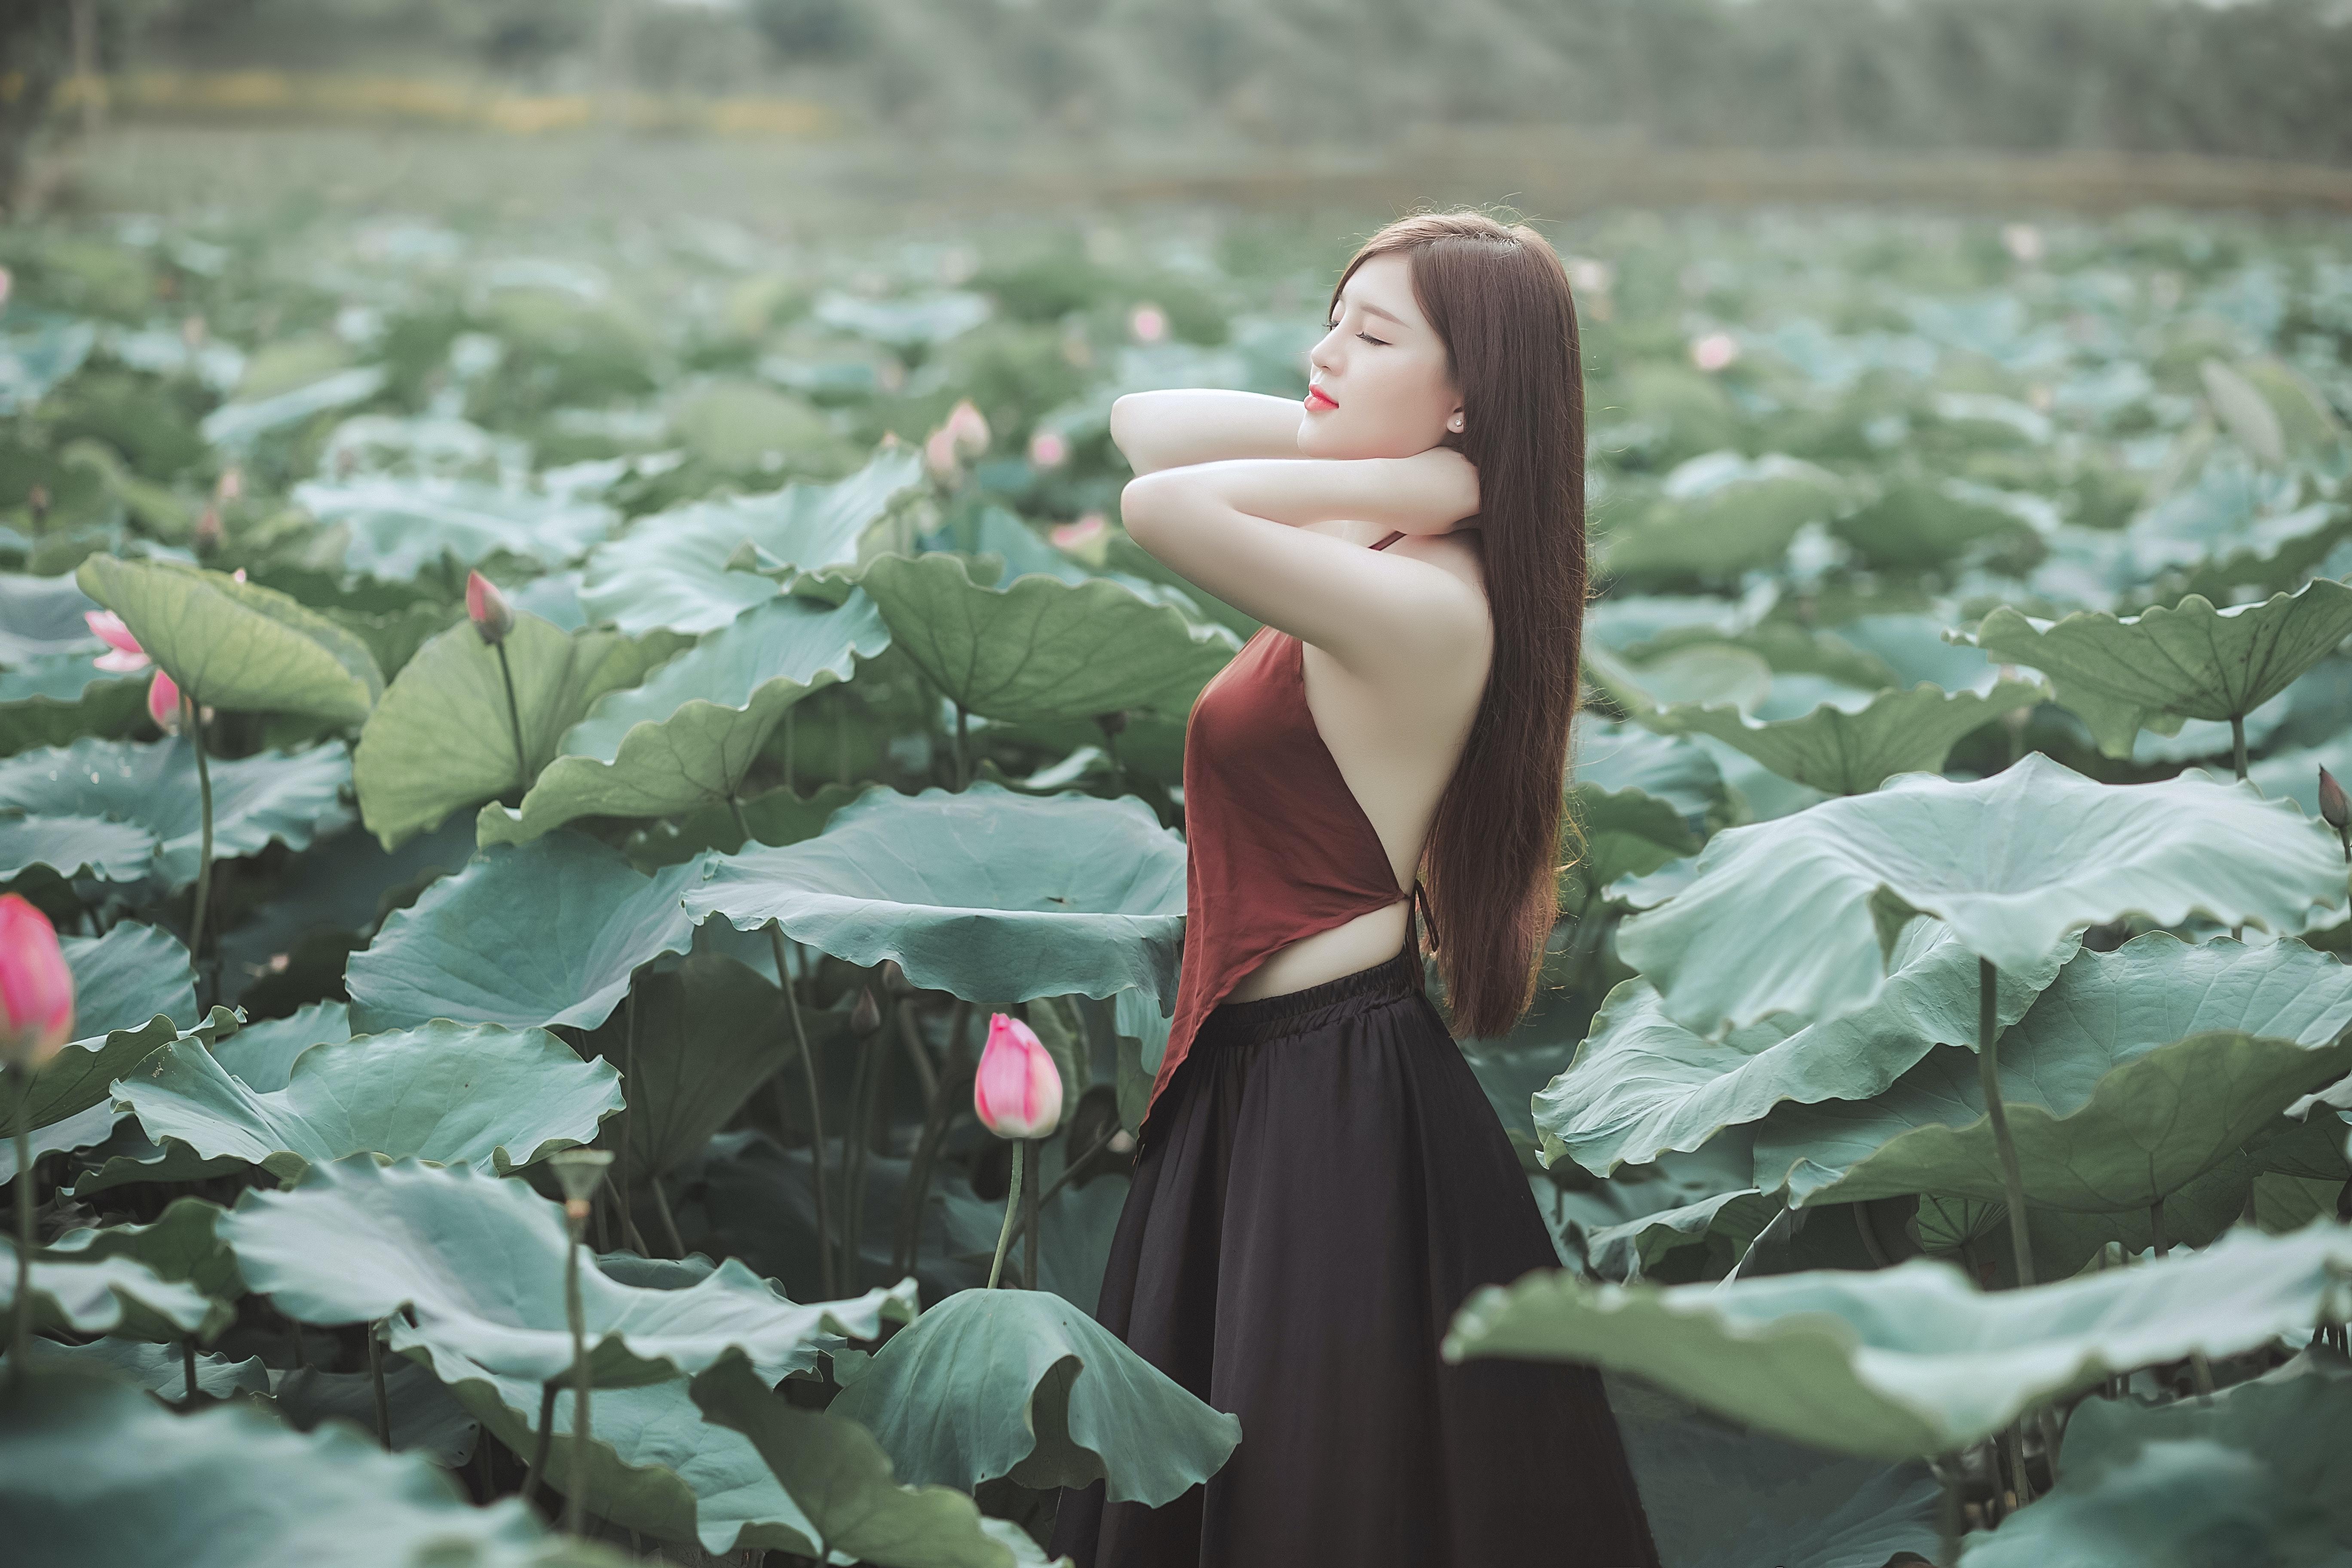 Consider, flowers tight brunette teen posing opinion